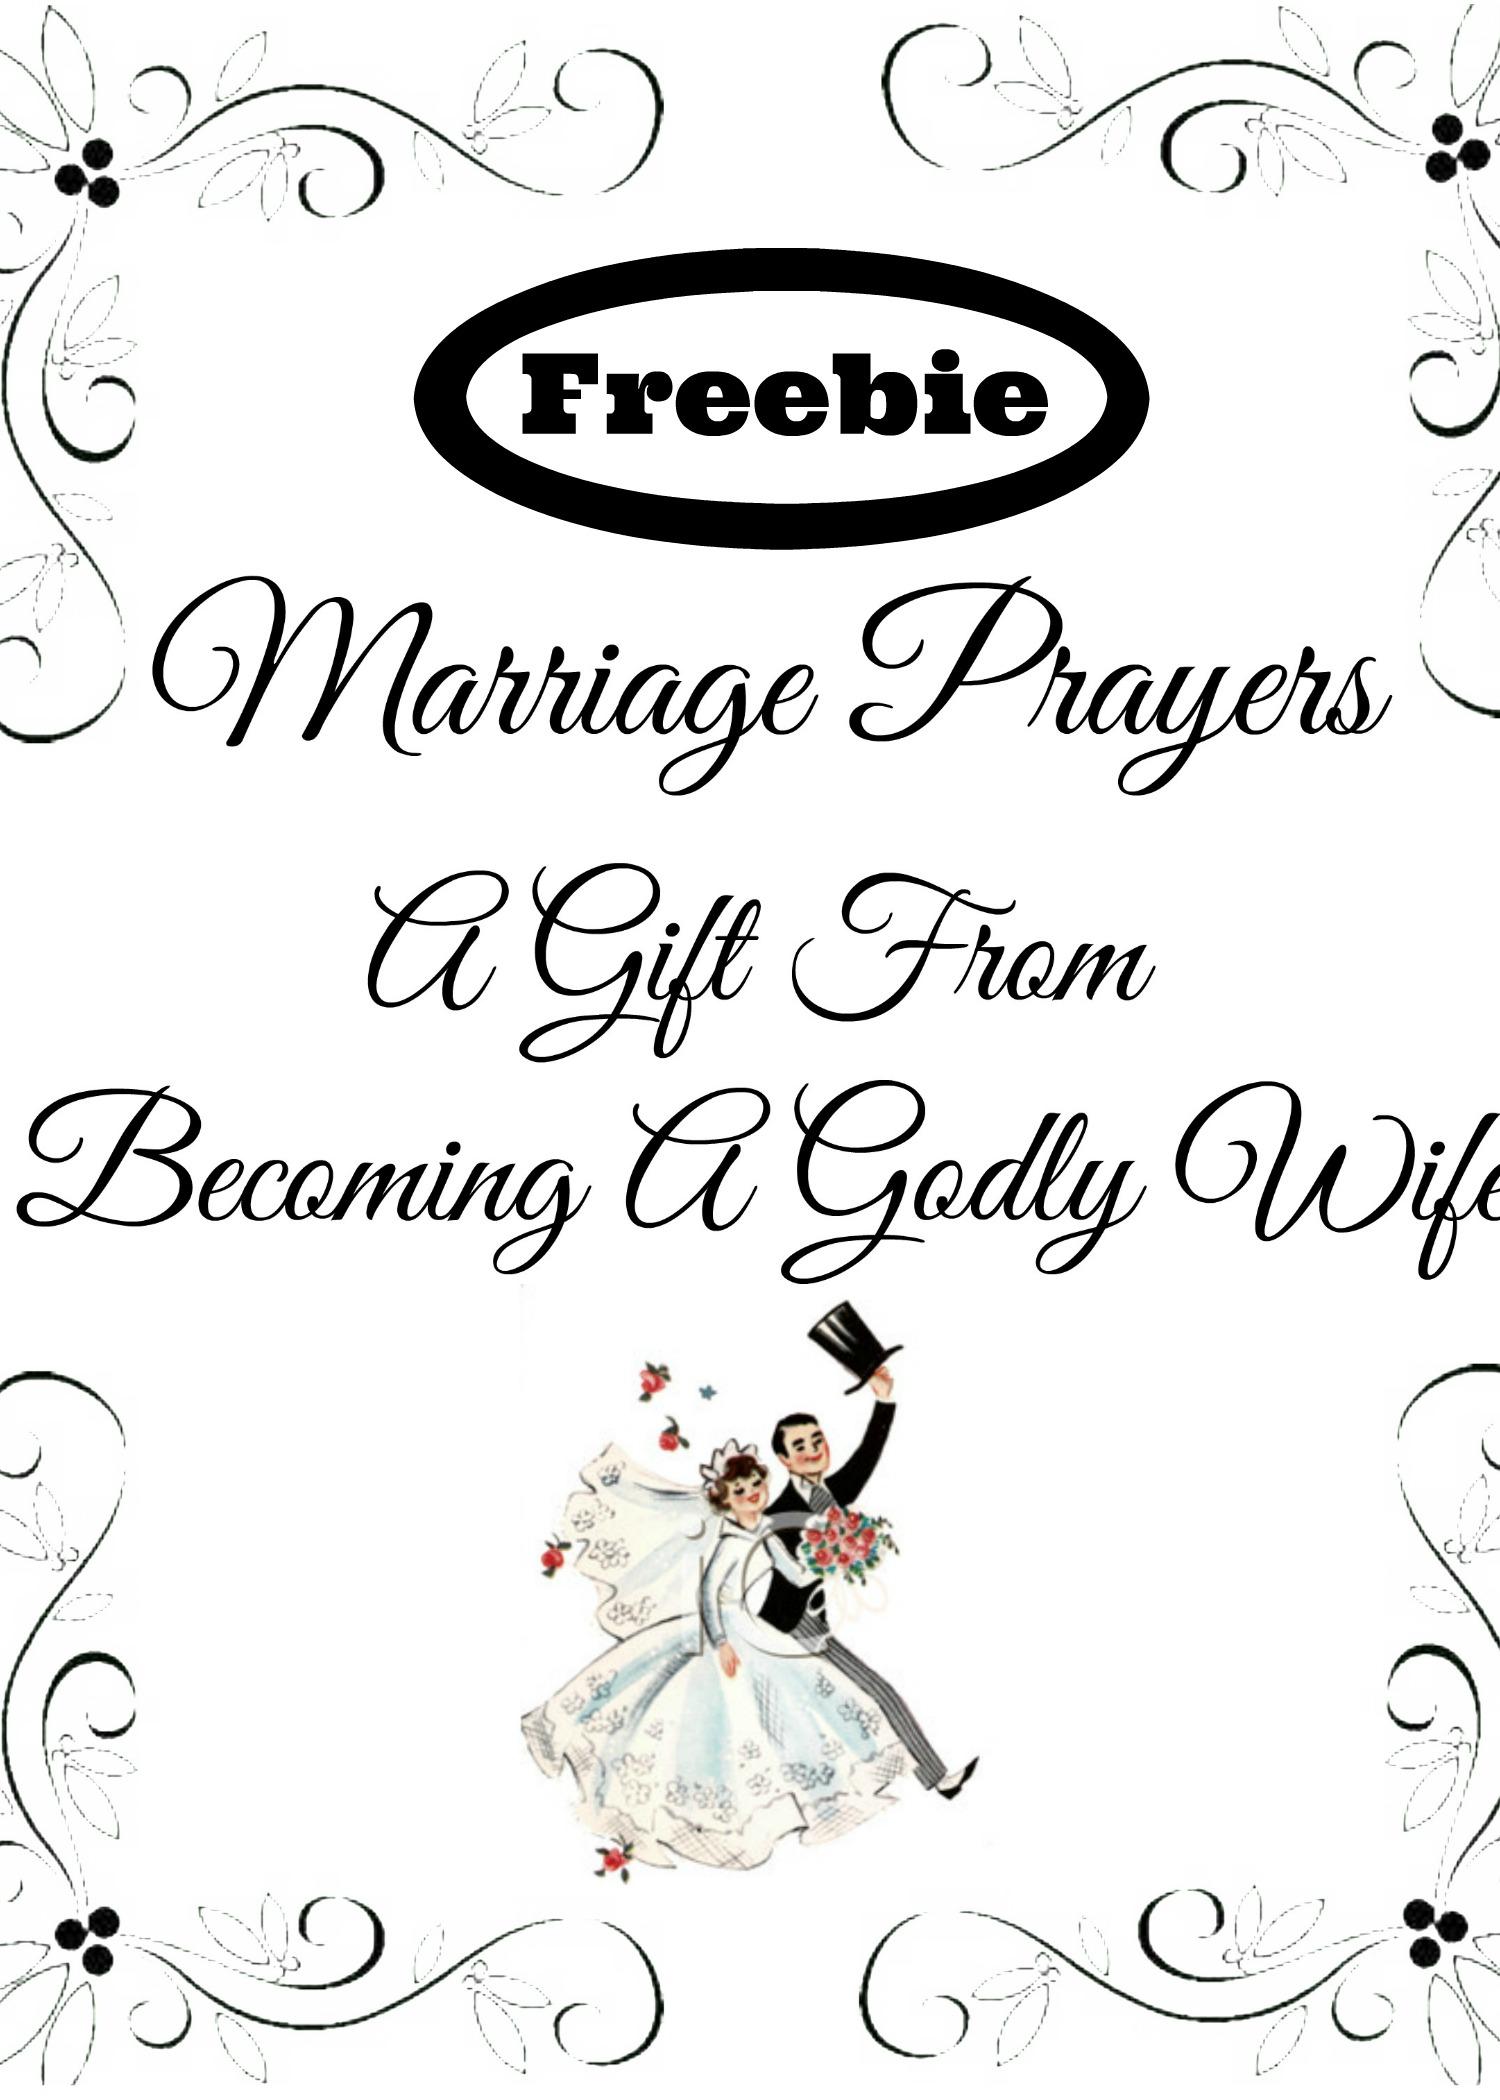 Marriage Prayer Cards Freebie